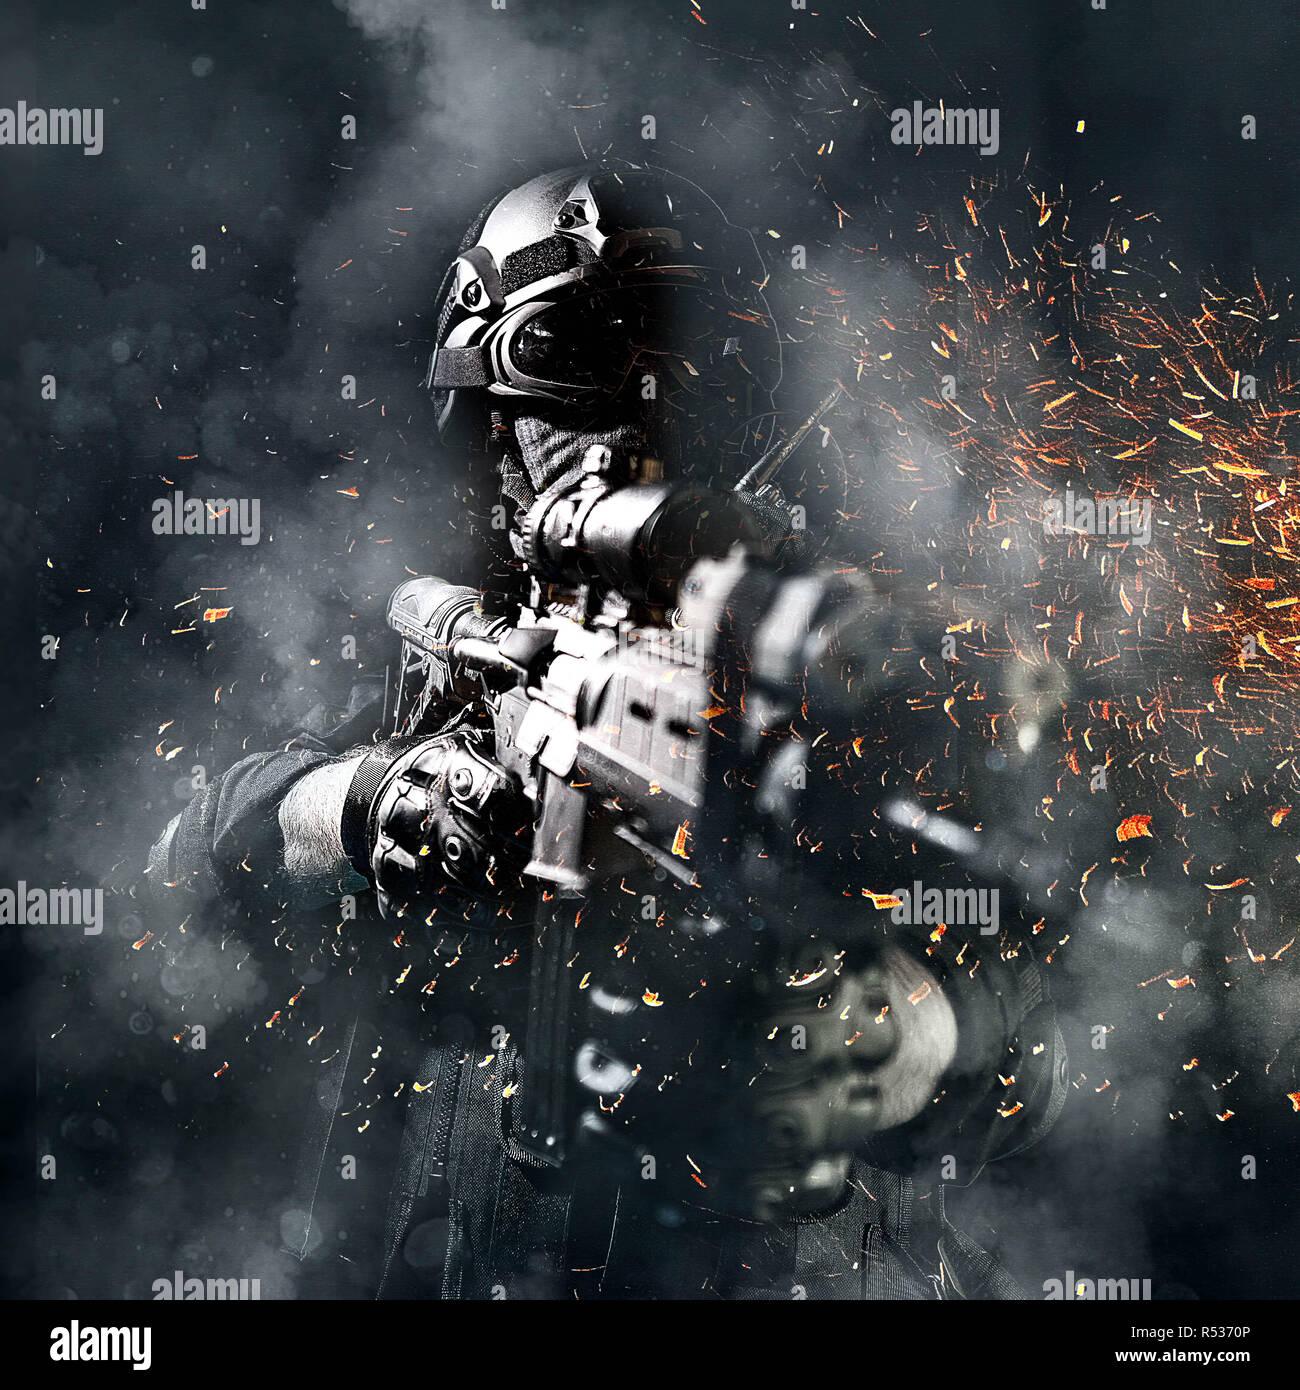 Special forces Soldat Polizei, SWAT-Team Mitglied Stockfoto